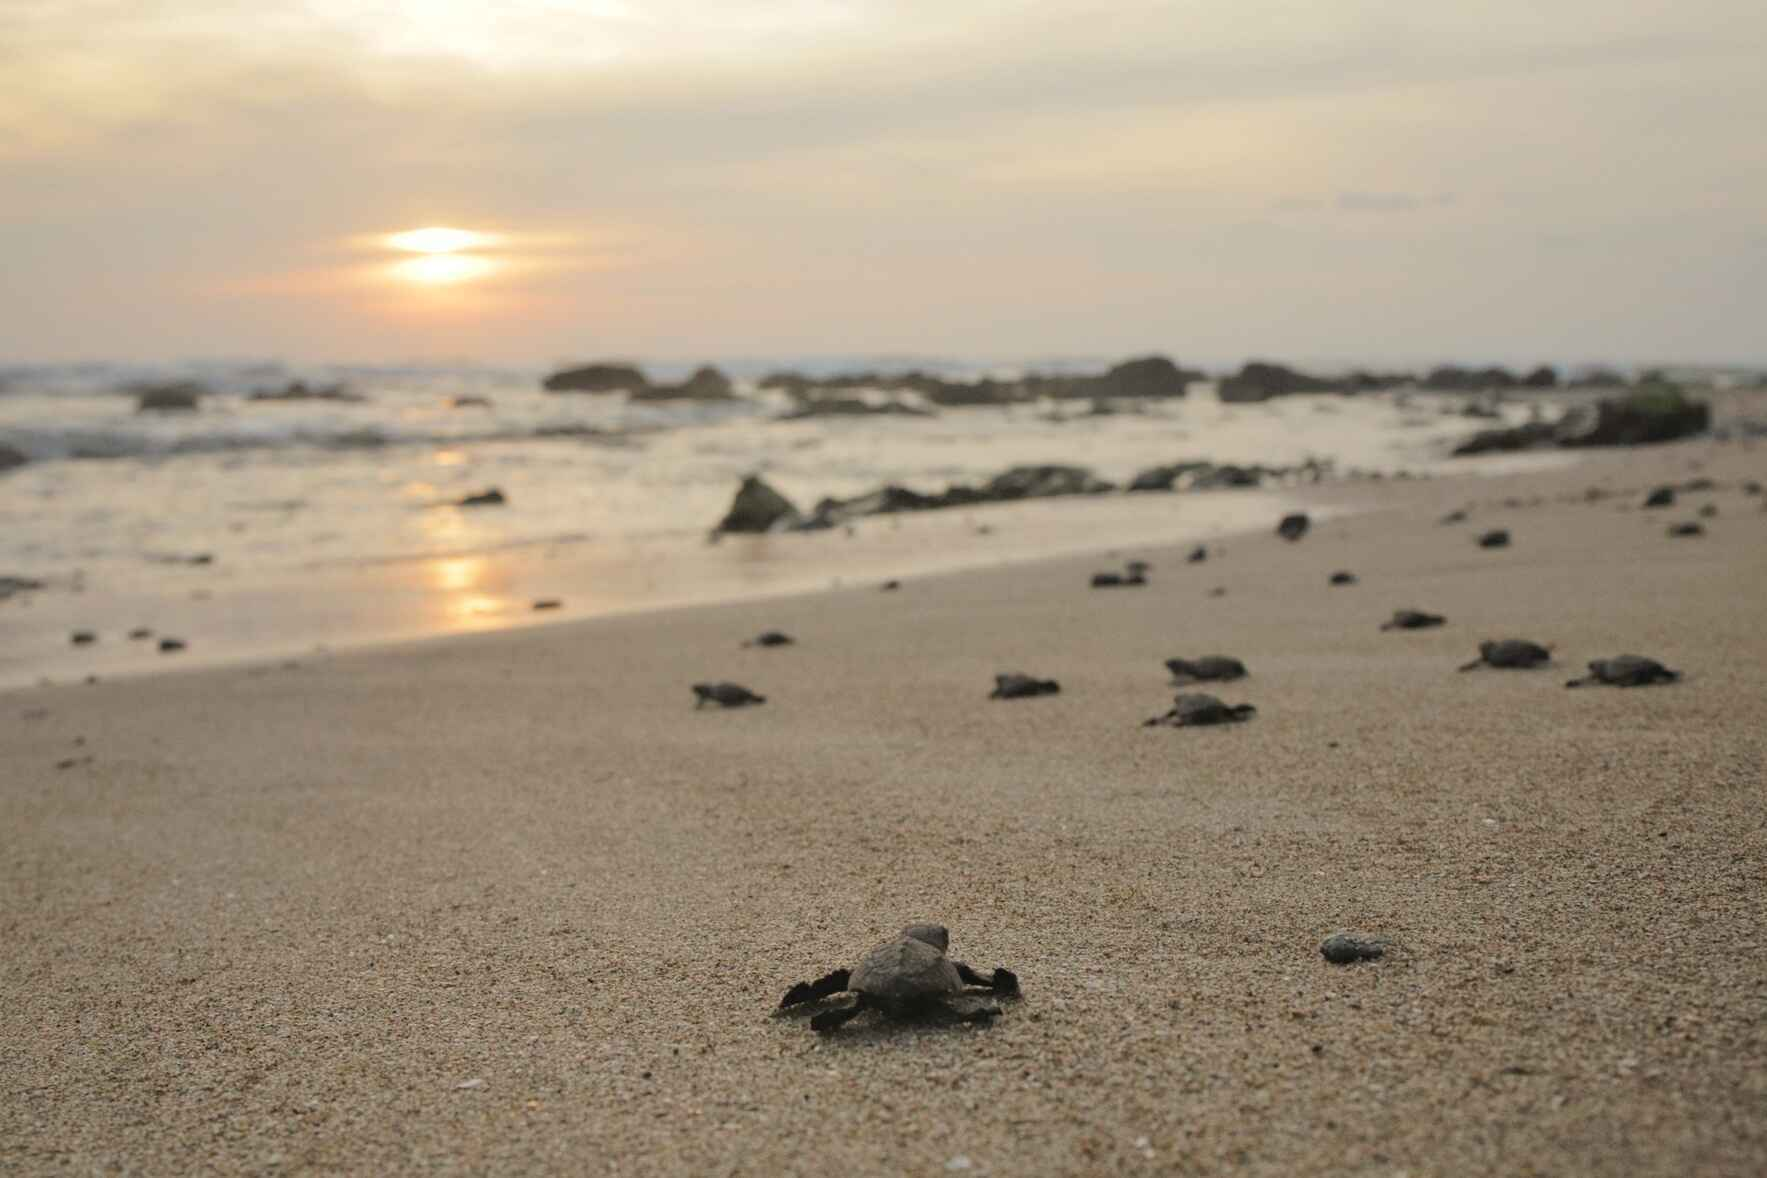 Help Protect Endangered Sea Turtles image